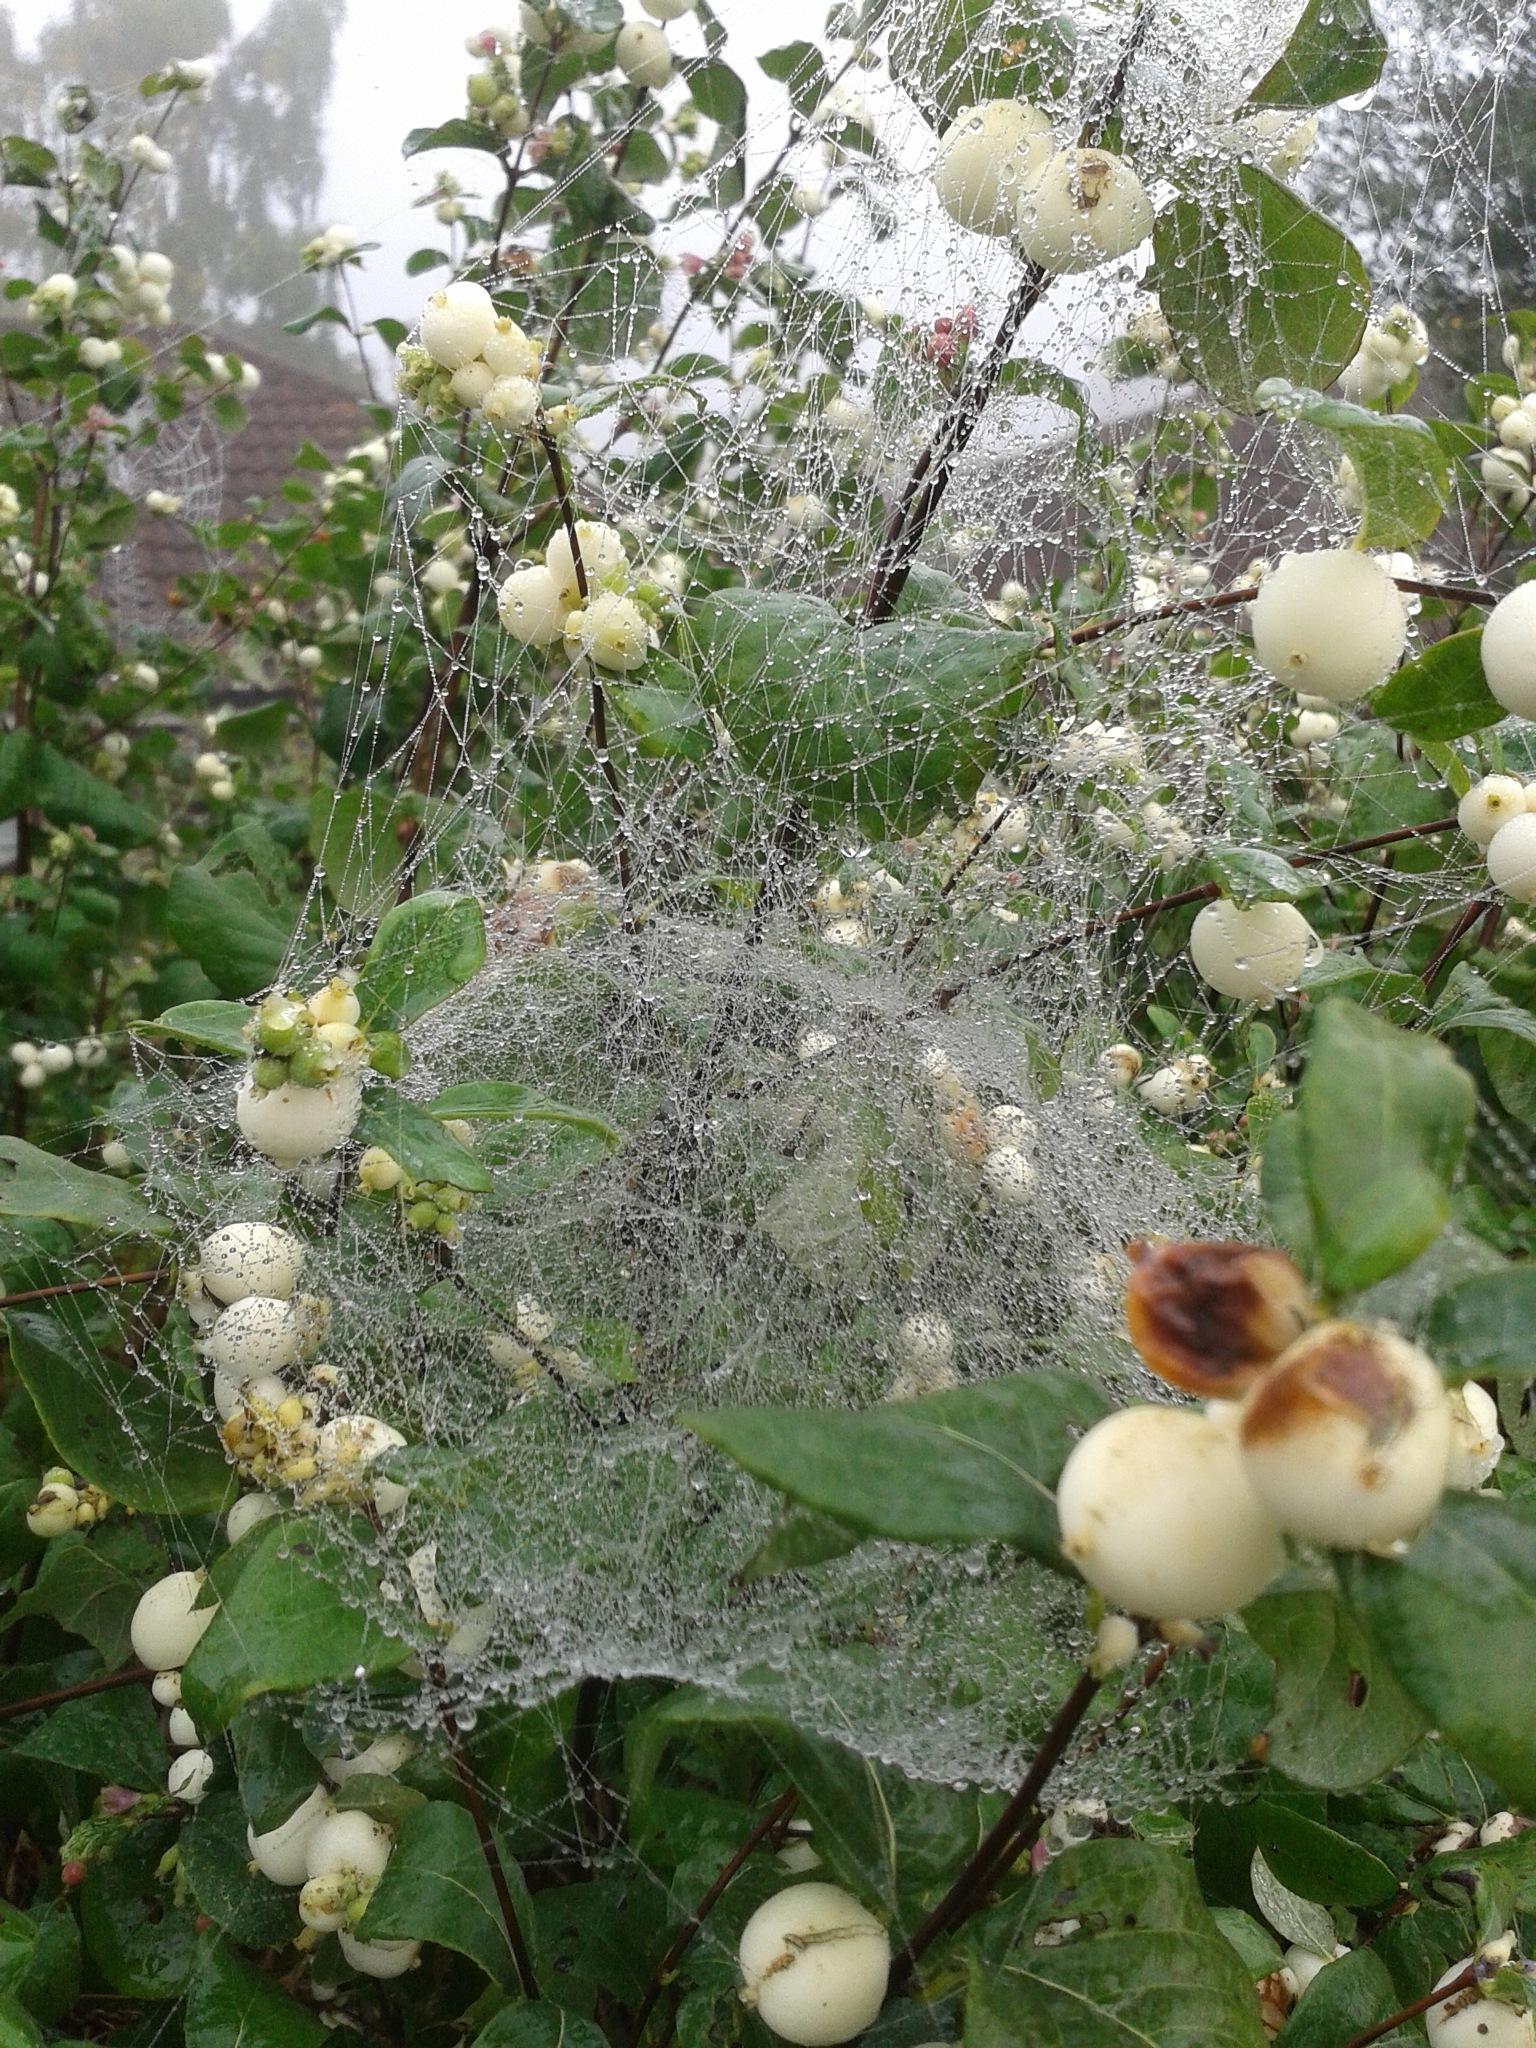 Wet Webs by Peta Rahmatalla